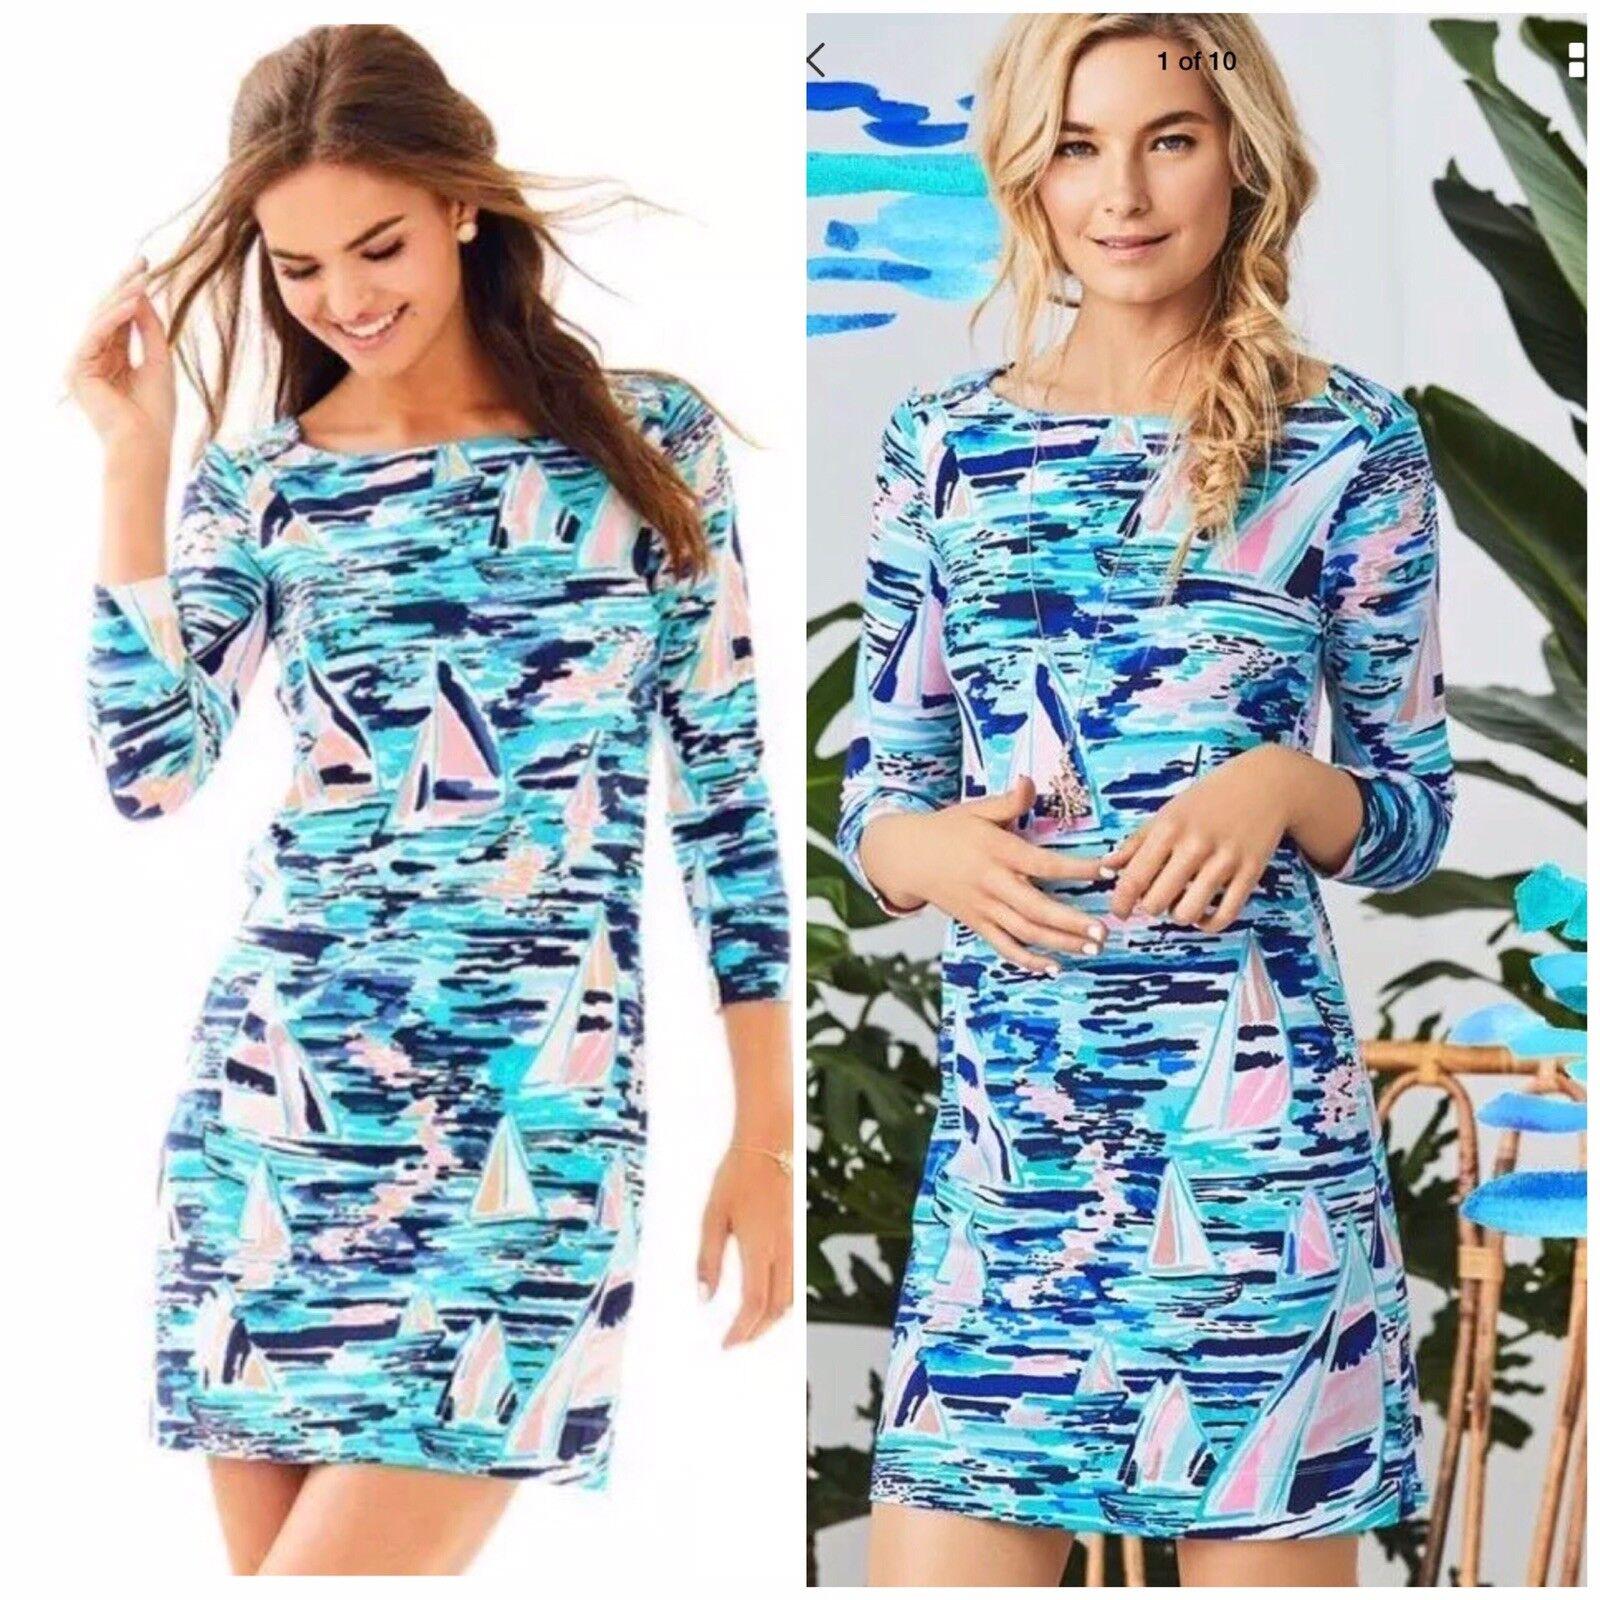 NWT Lilly Pulitzer UPF 50+ 3 4 Sleeve Tammy Dress in Multi Pier Pressure-Size L